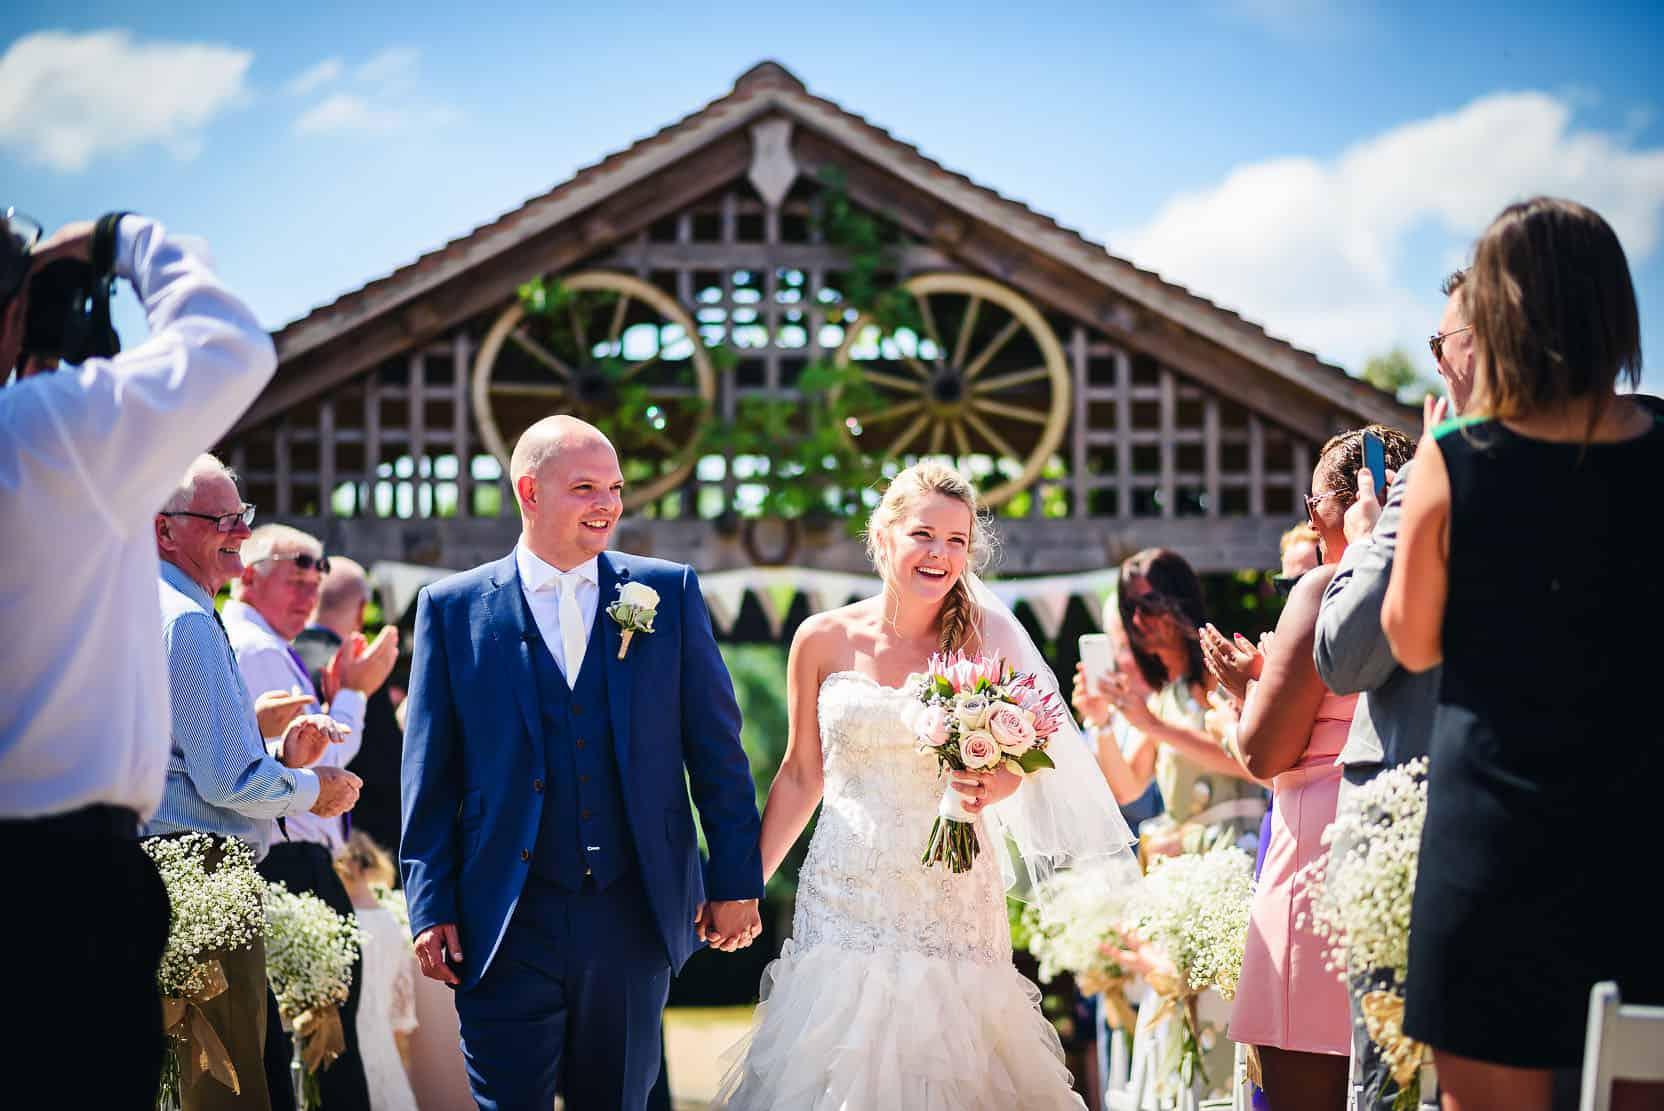 018_Maidens_Barn_Wedding_Essex_NJ_Justin_Bailey_Photography